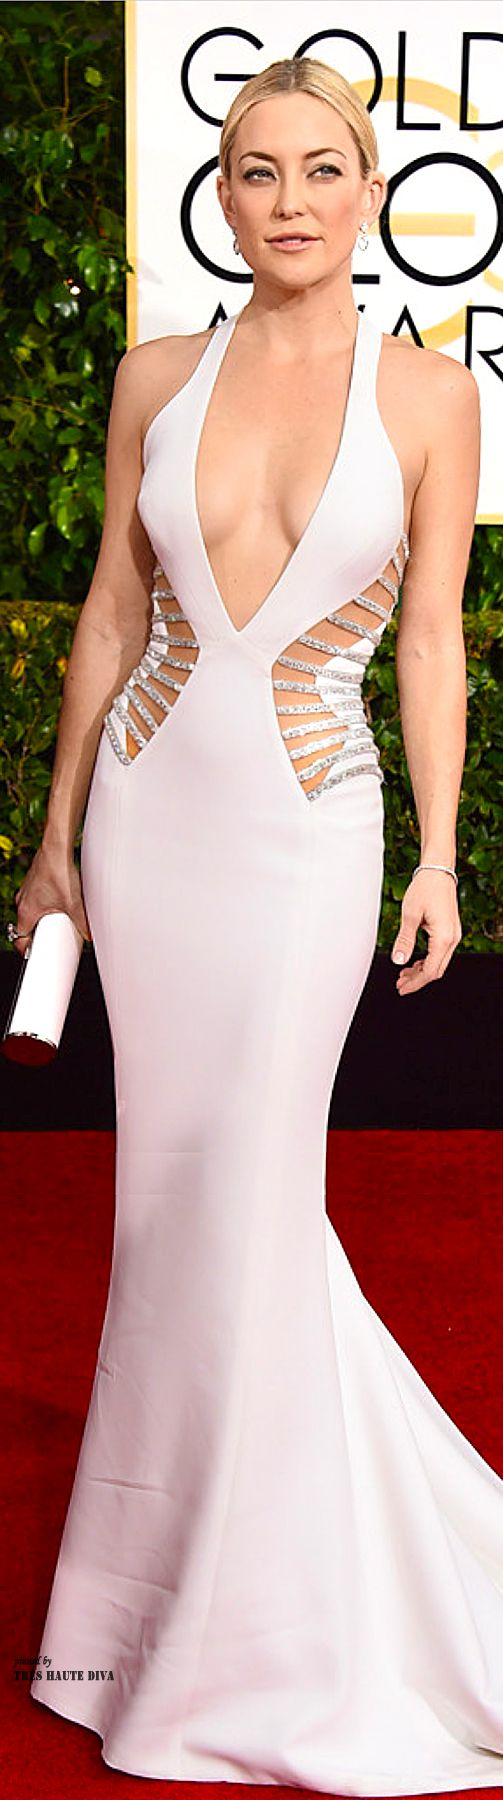 Kate Hudson in Versace - Golden Globe Awards 2015  ♔THD♔